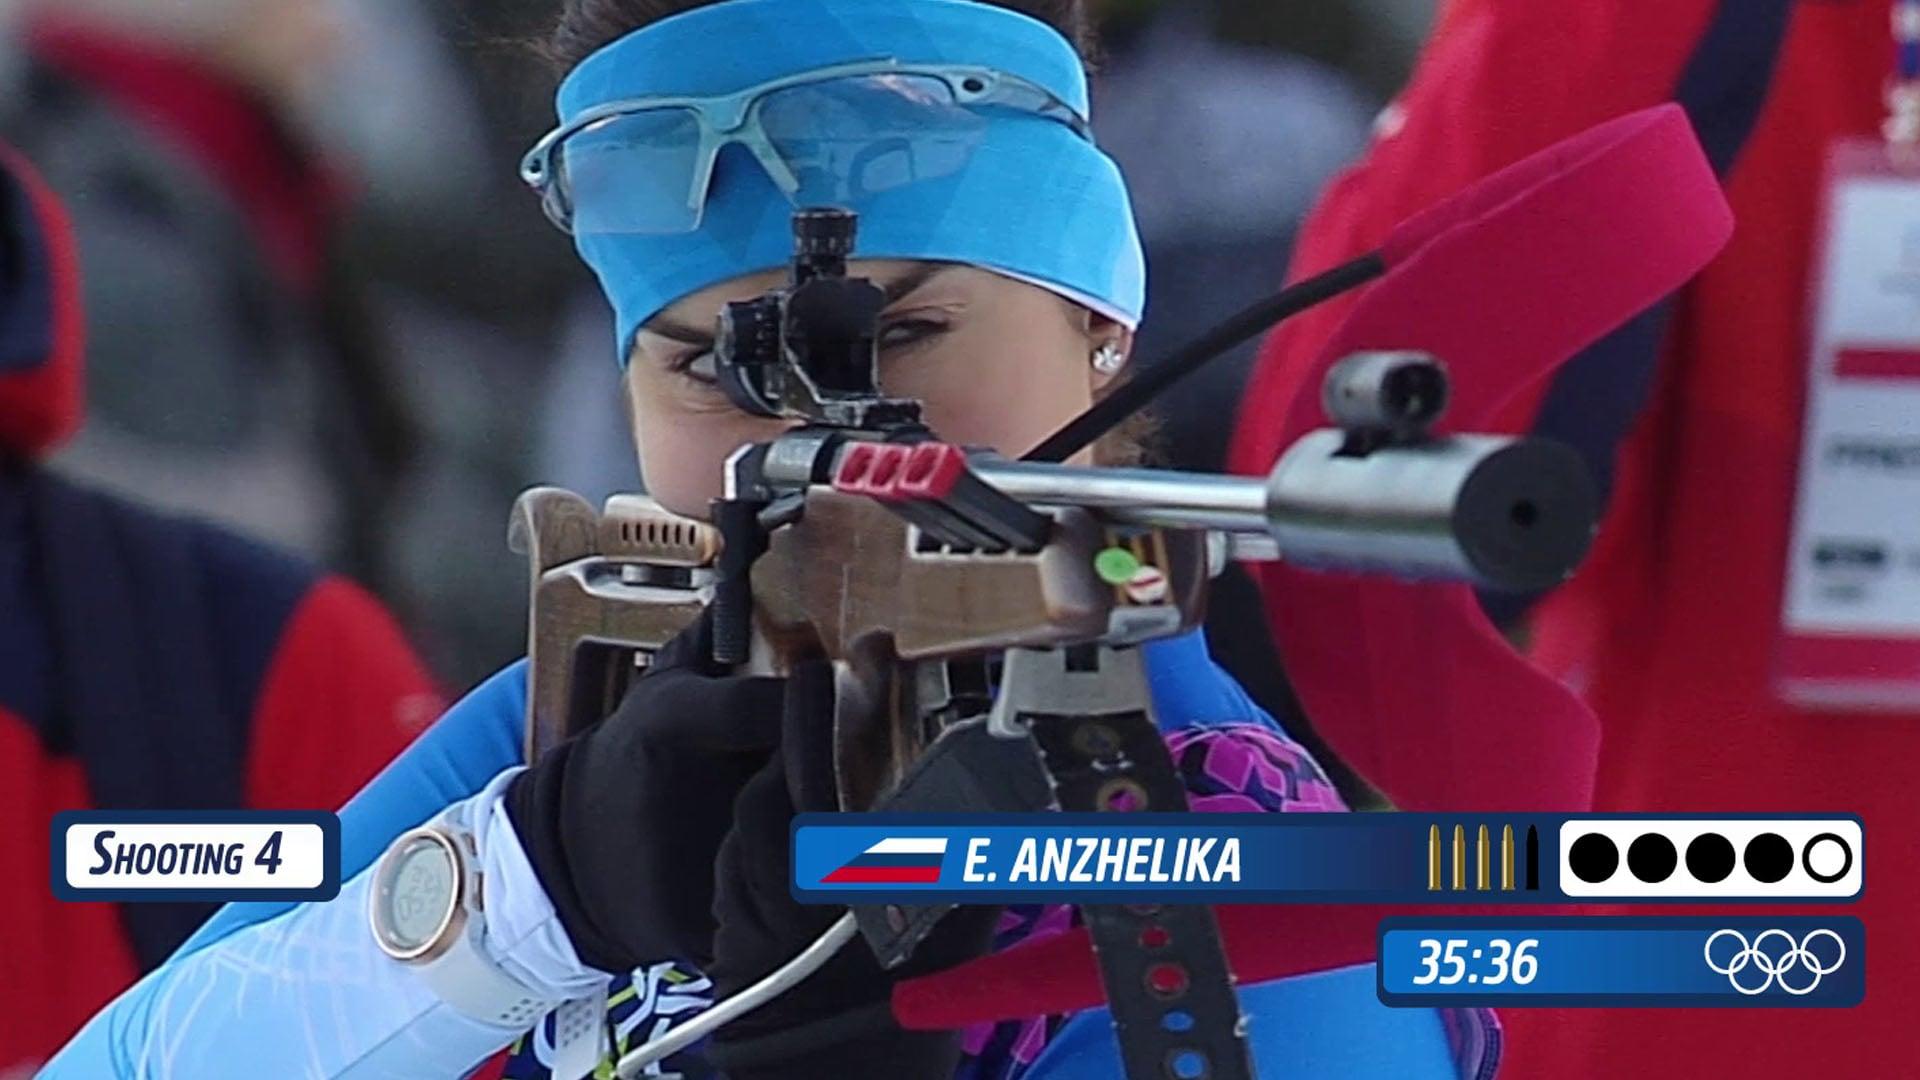 France Télévision - Silent Olympic games